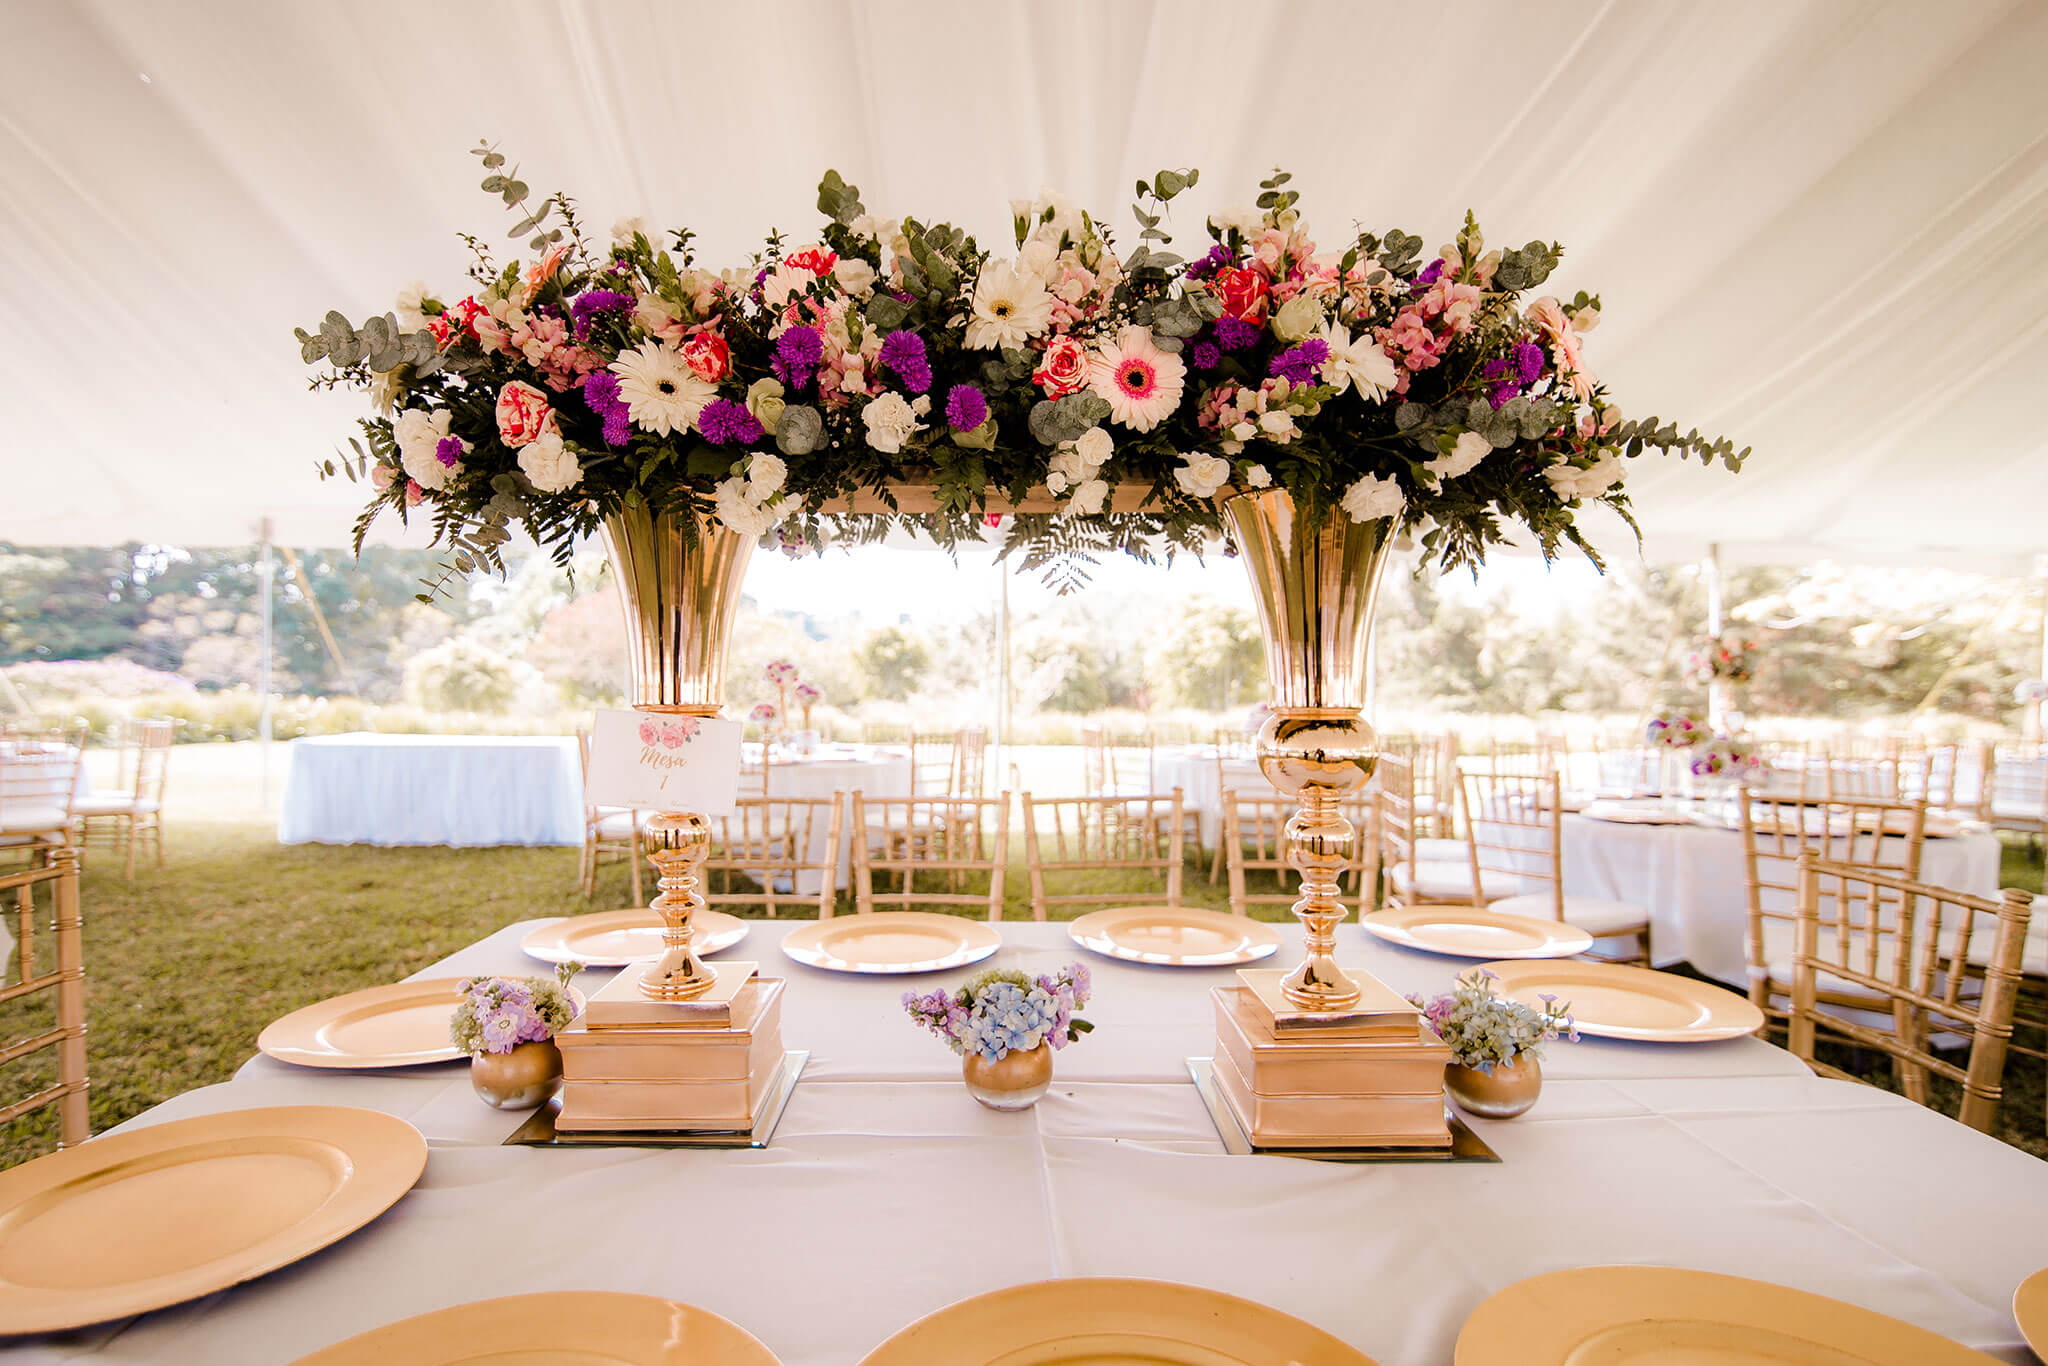 8 unique ideas to plan a trendy brunch wedding | Cocomelody Mag